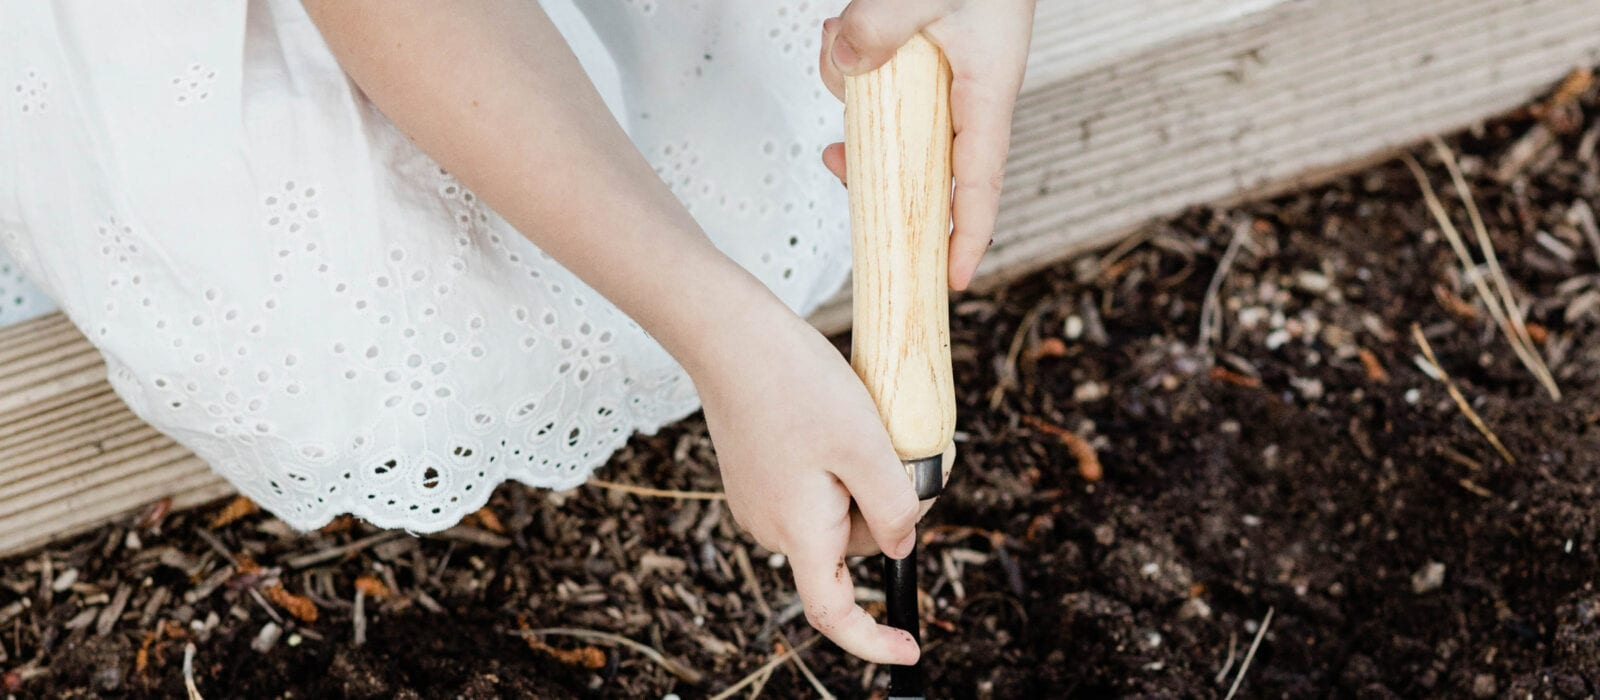 DIY: A FREE Raised Garden Bed!